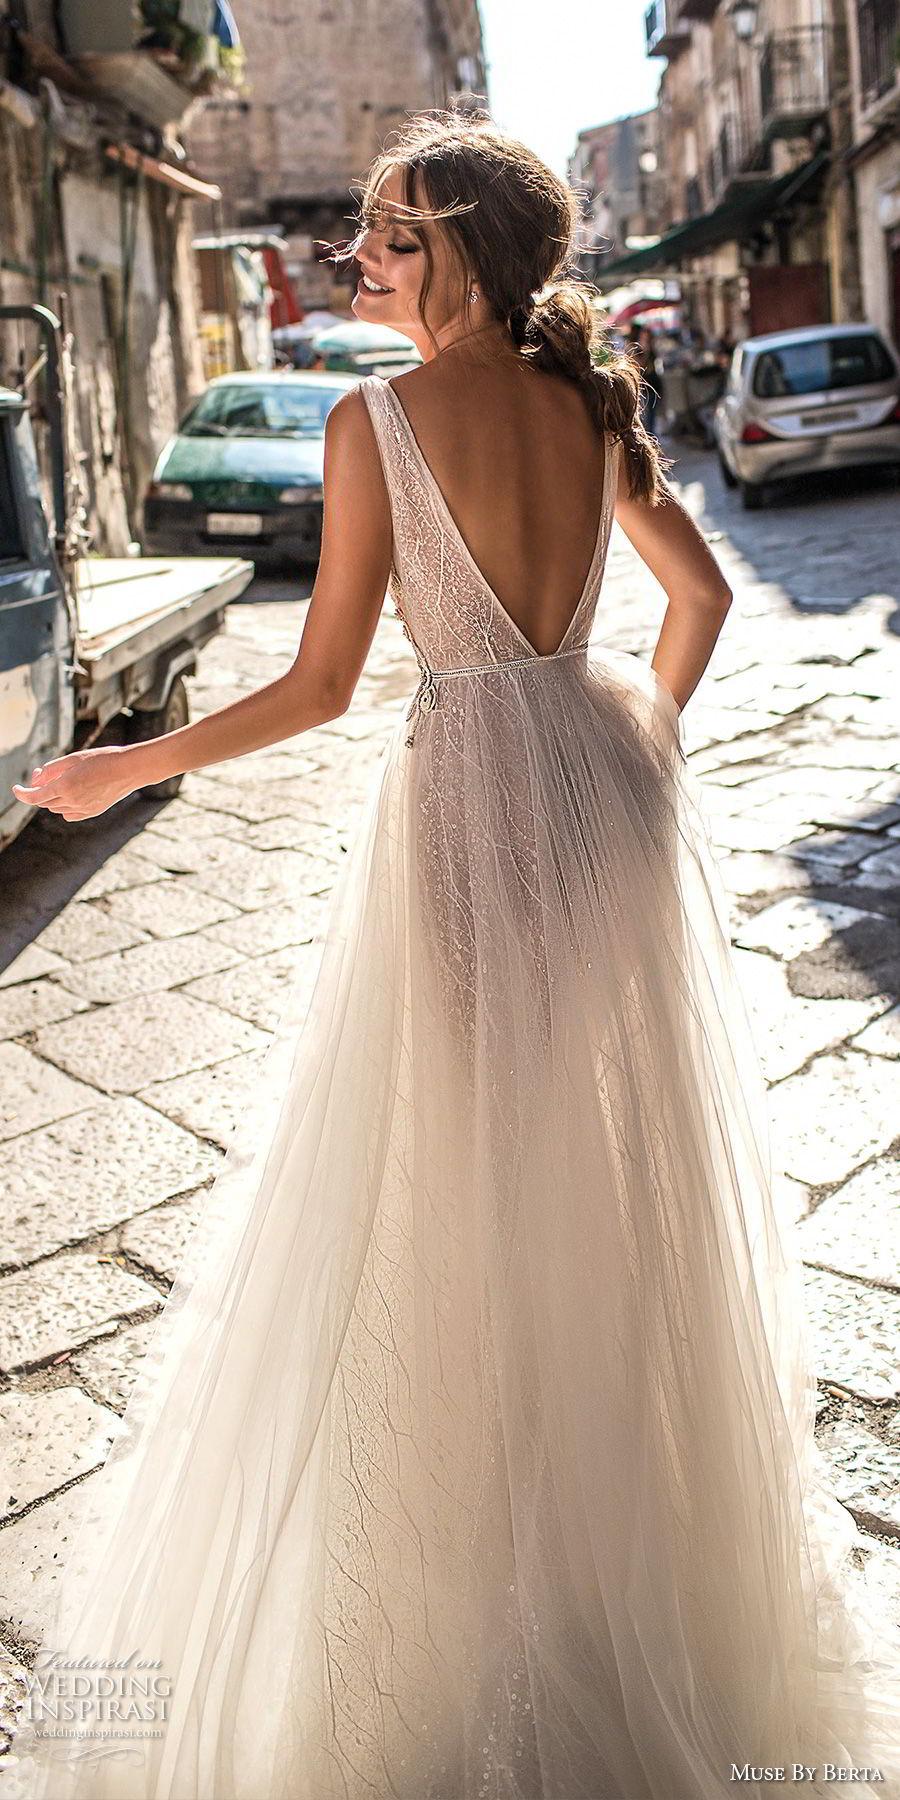 muse-berta-2018-bridal-sleeveless-deep-v-neck-lightly-embellished-bodice-tulle-skirt-romantic-soft-a-line-wedding-dress-open-v-back-medium-train-4-bv